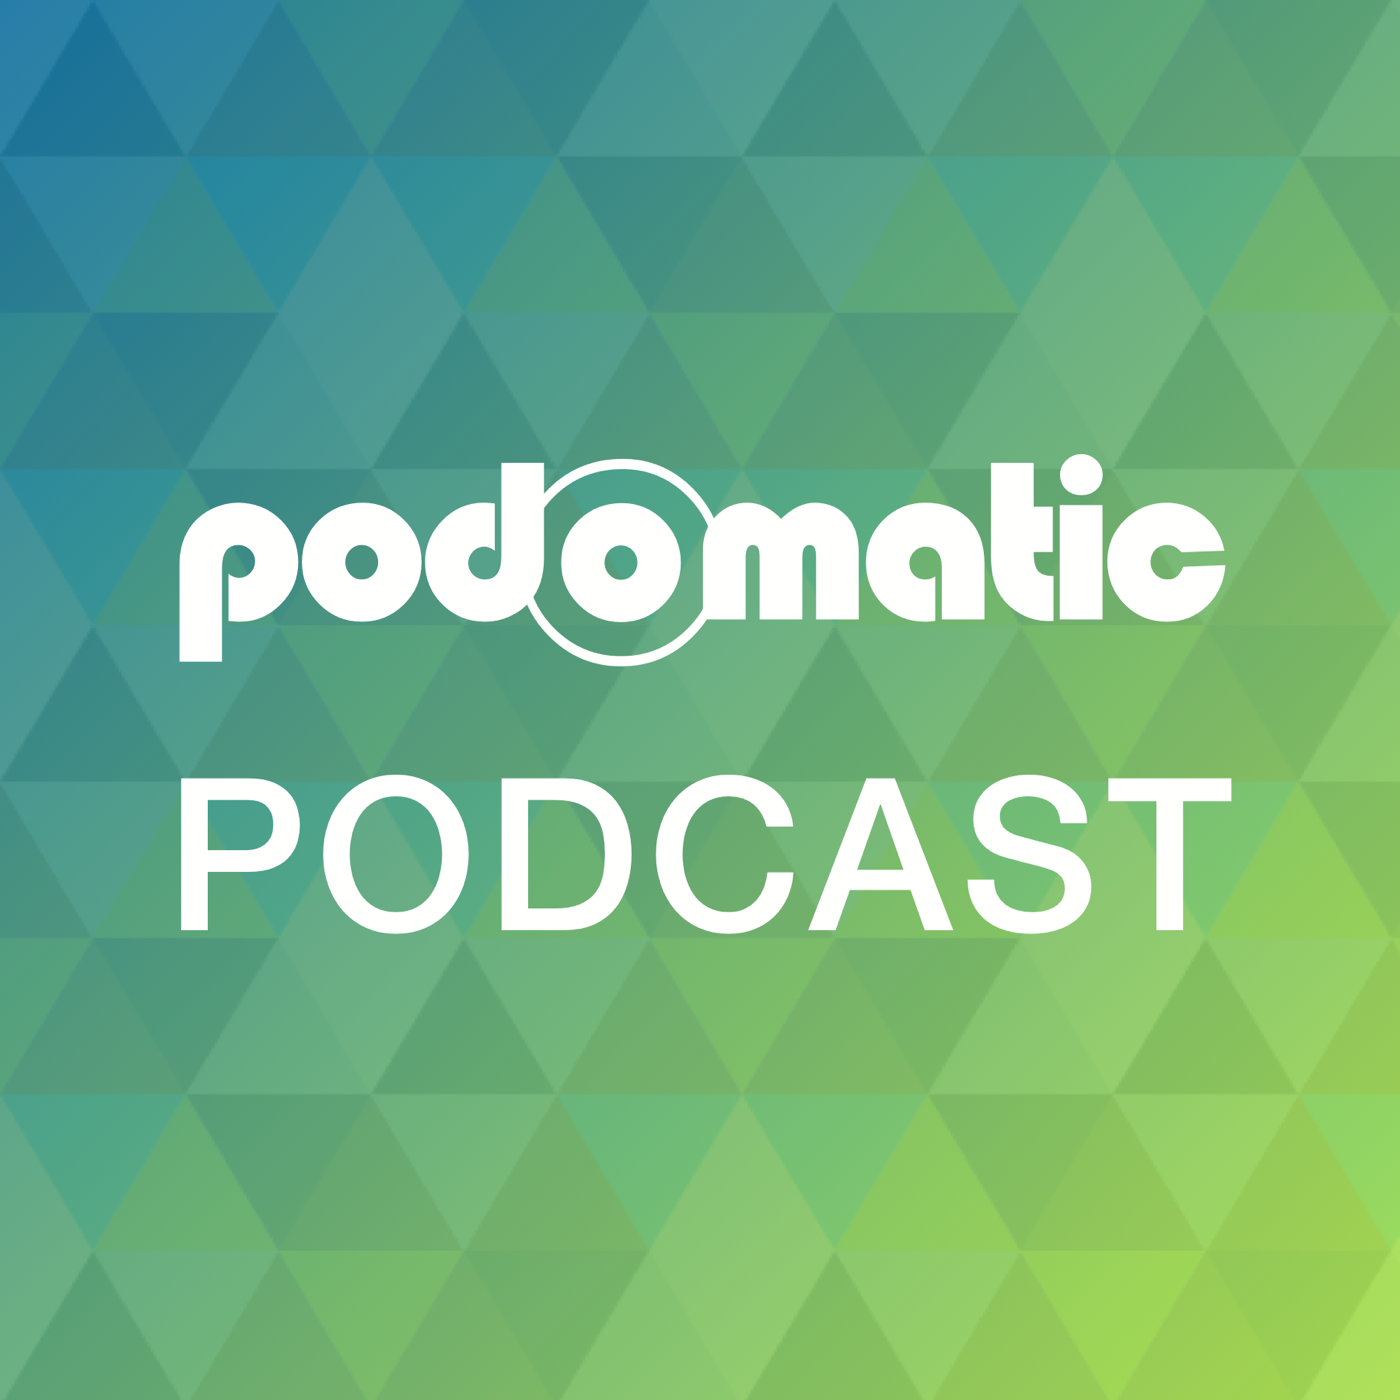 Robert Peterman's Podcast